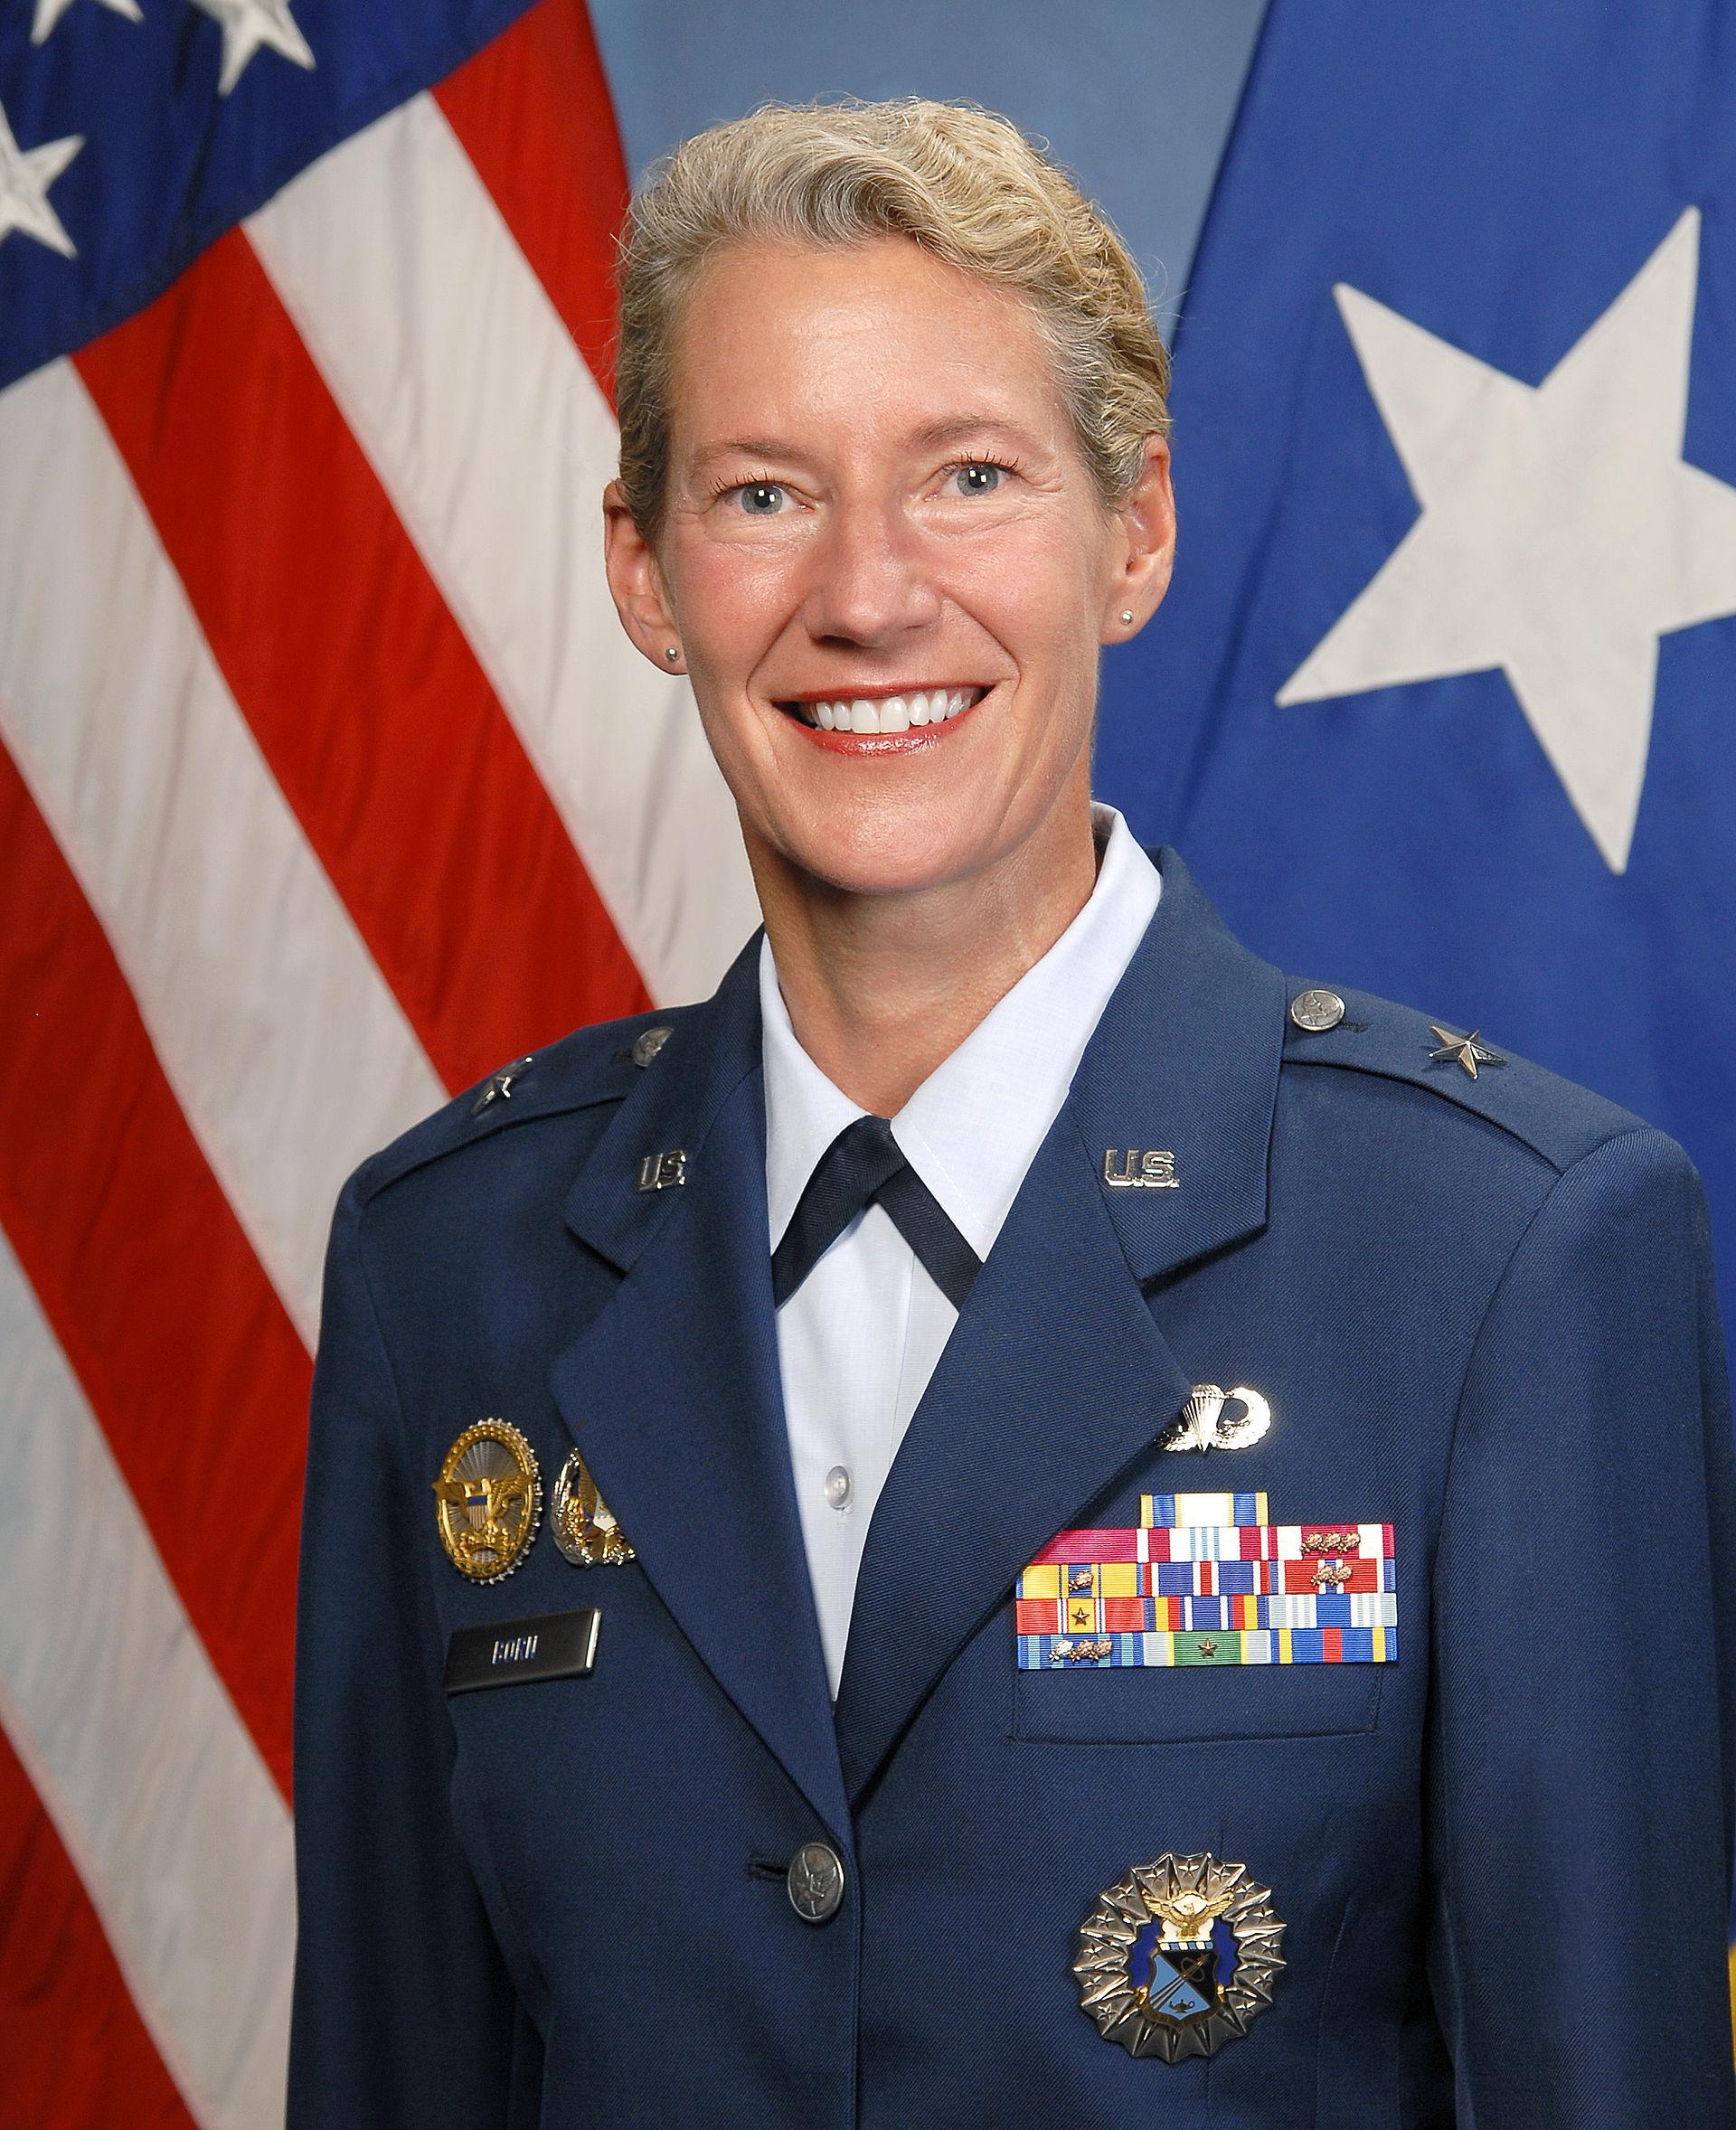 Air Force Academy Dean Of Faculty Announces Retirement: Dana H. Born